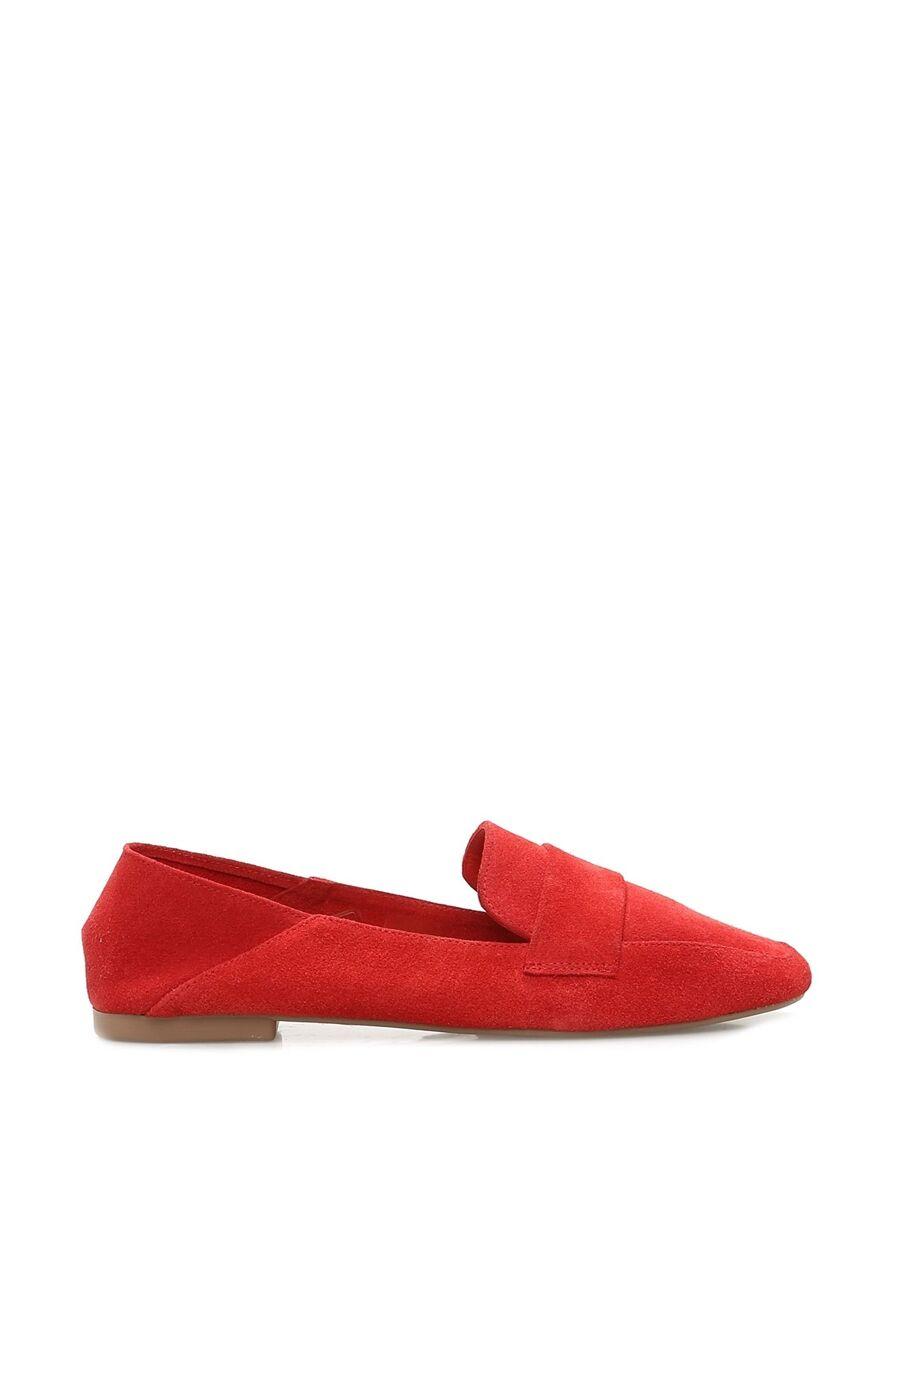 Dıvarese Süet Kırmızı Loafer – 299.0 TL